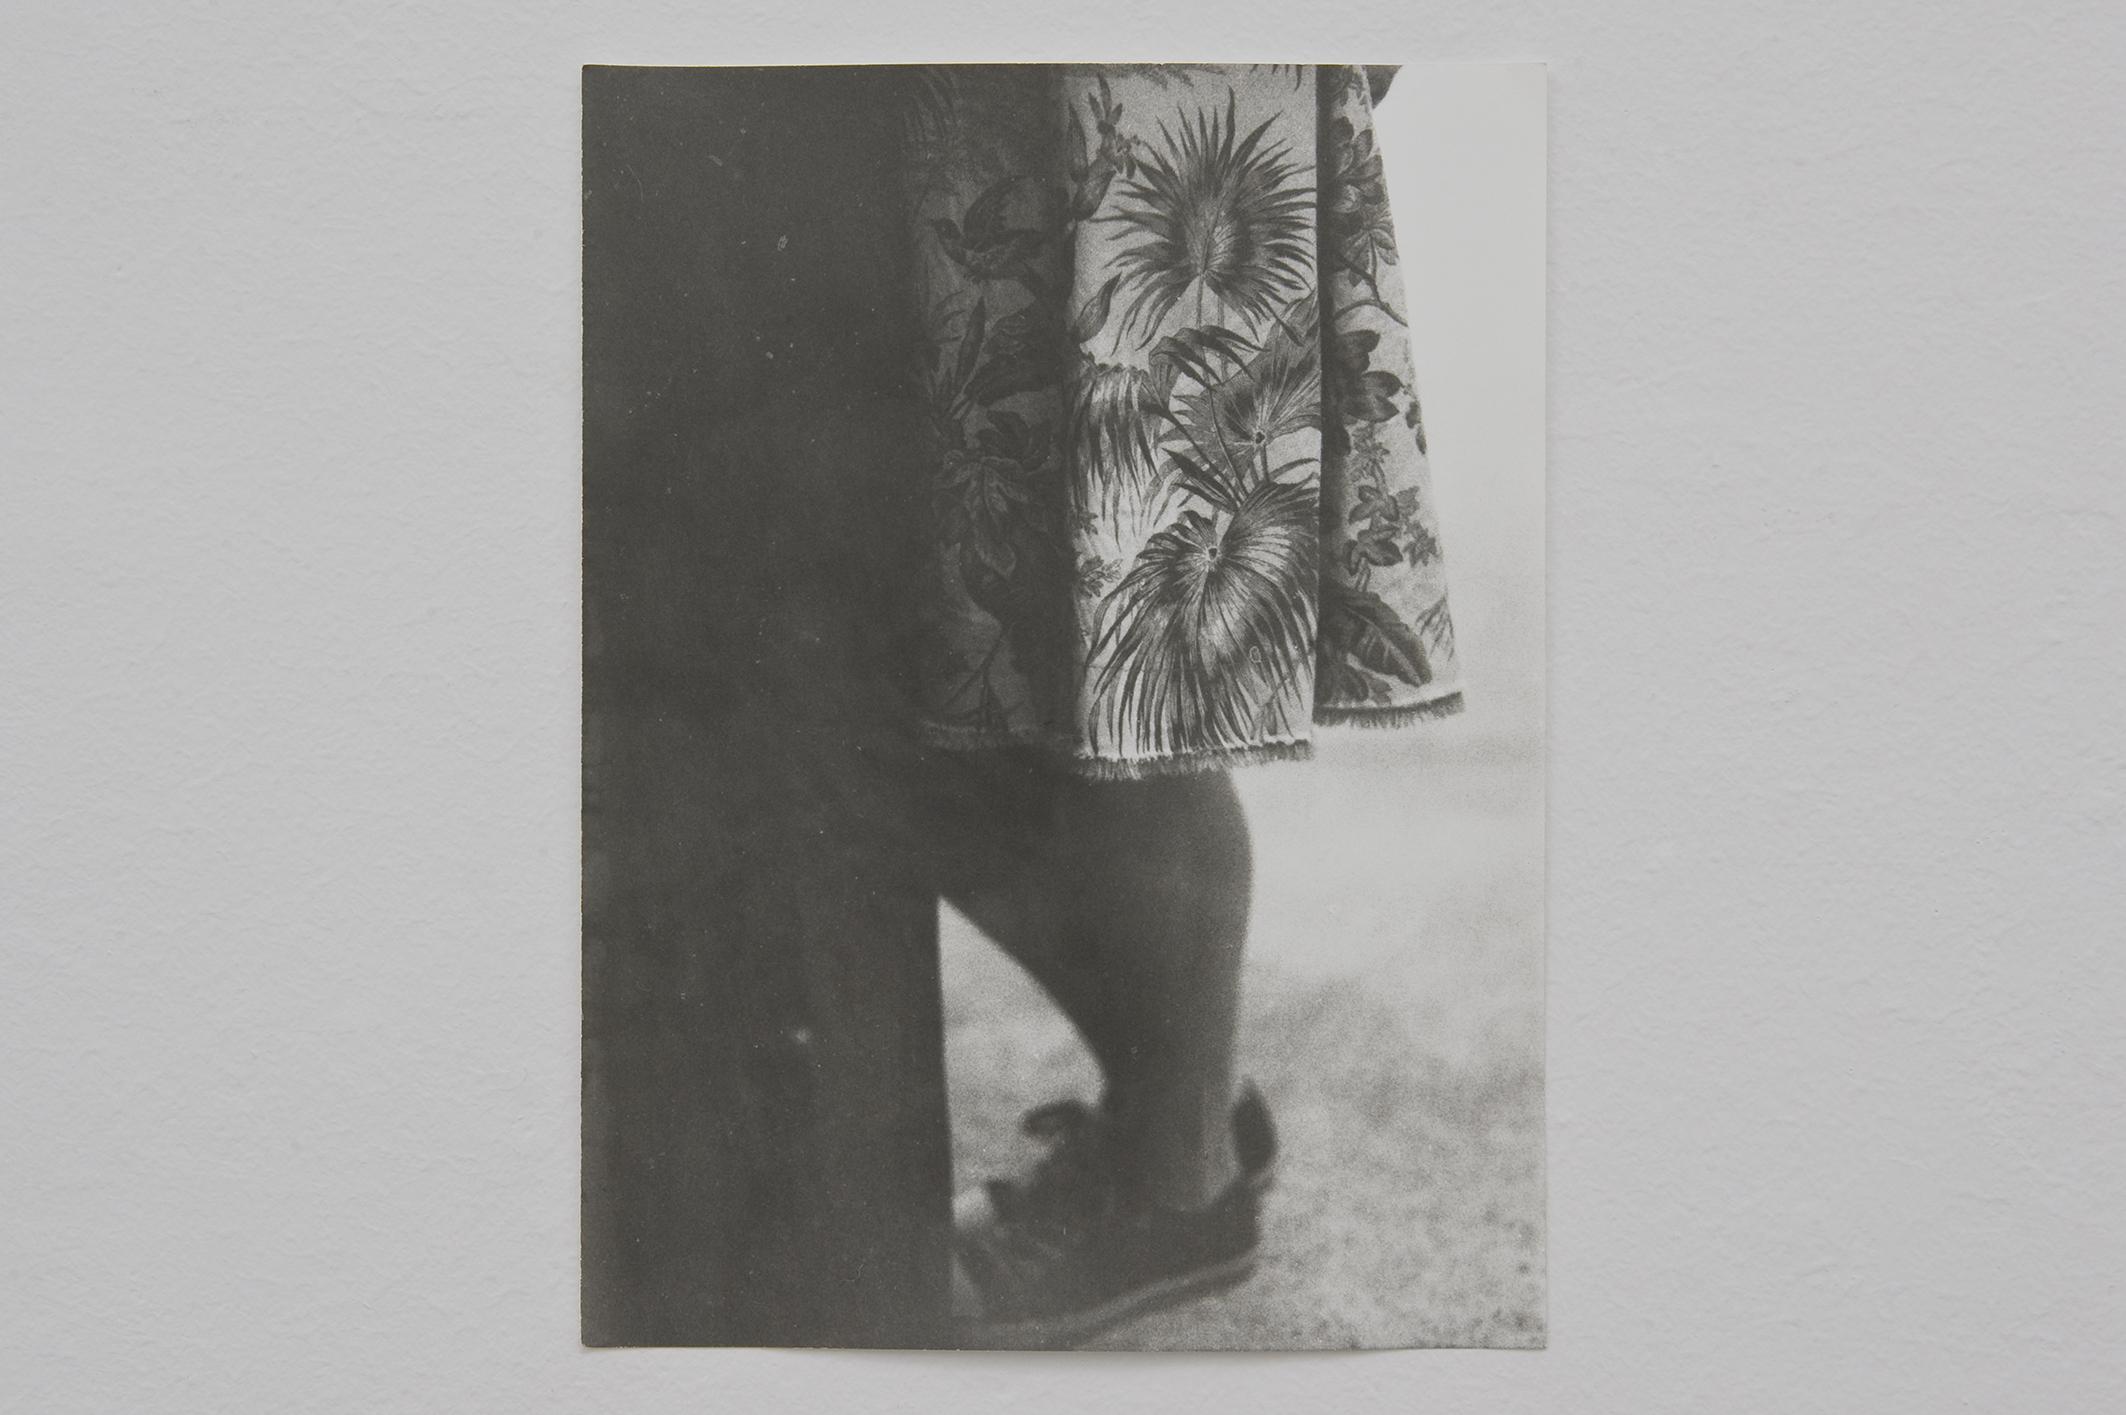 Untitled, 2014 | Jochen Lempert | ProjecteSD